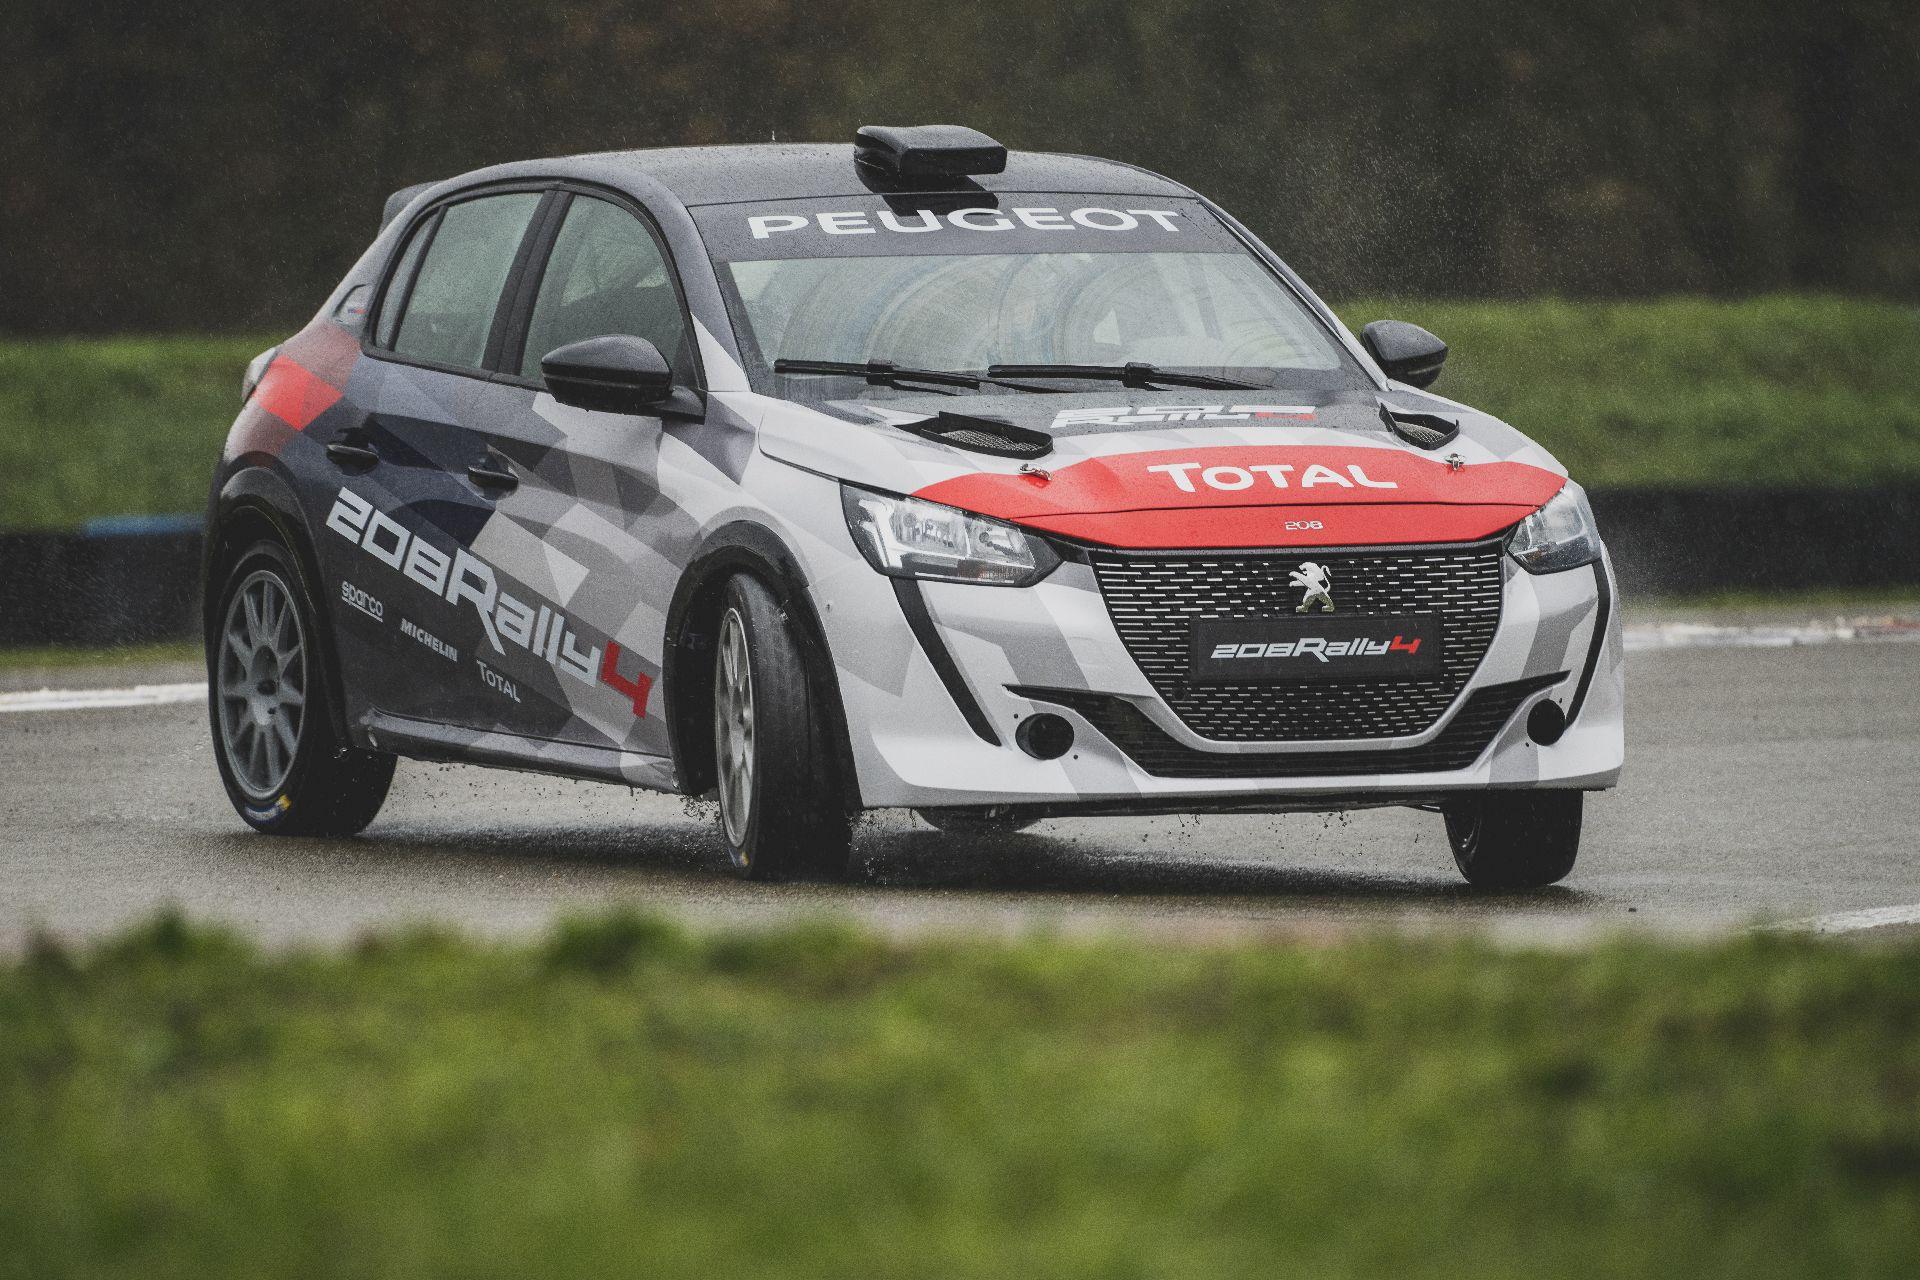 Peugeot_208_Rally4-01